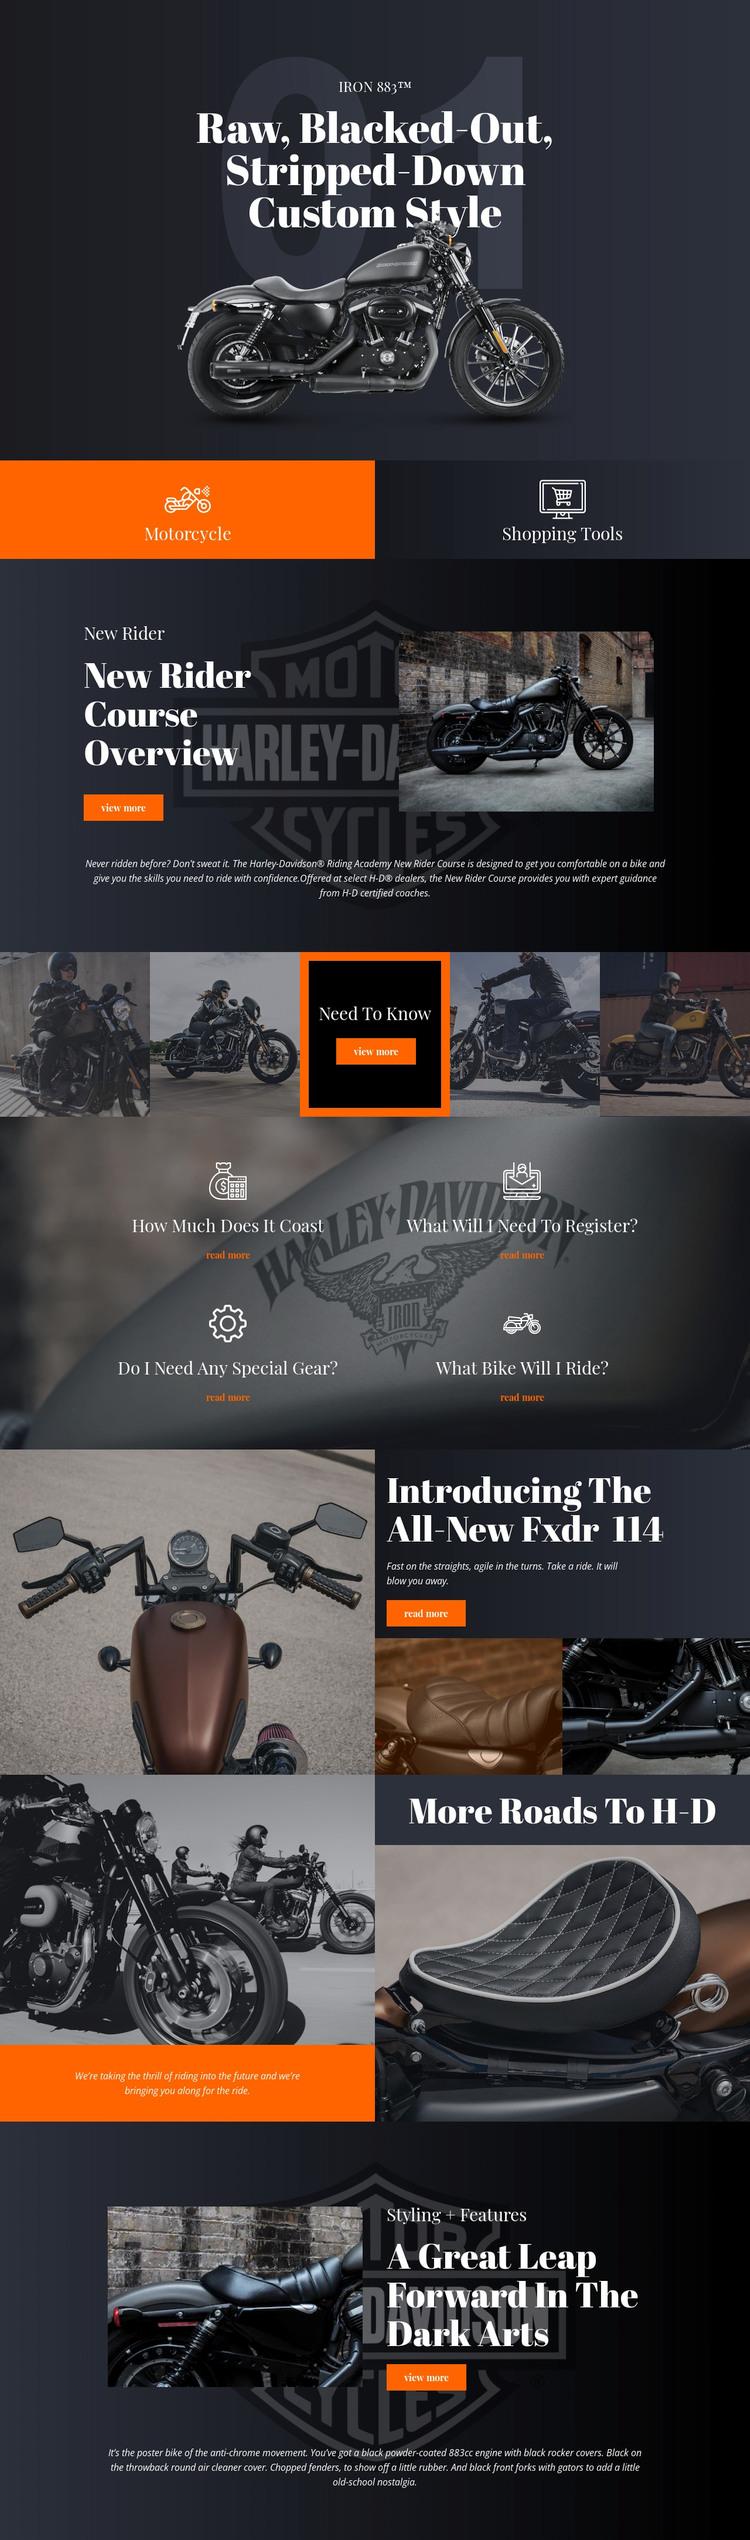 Harley Davidson WordPress Theme